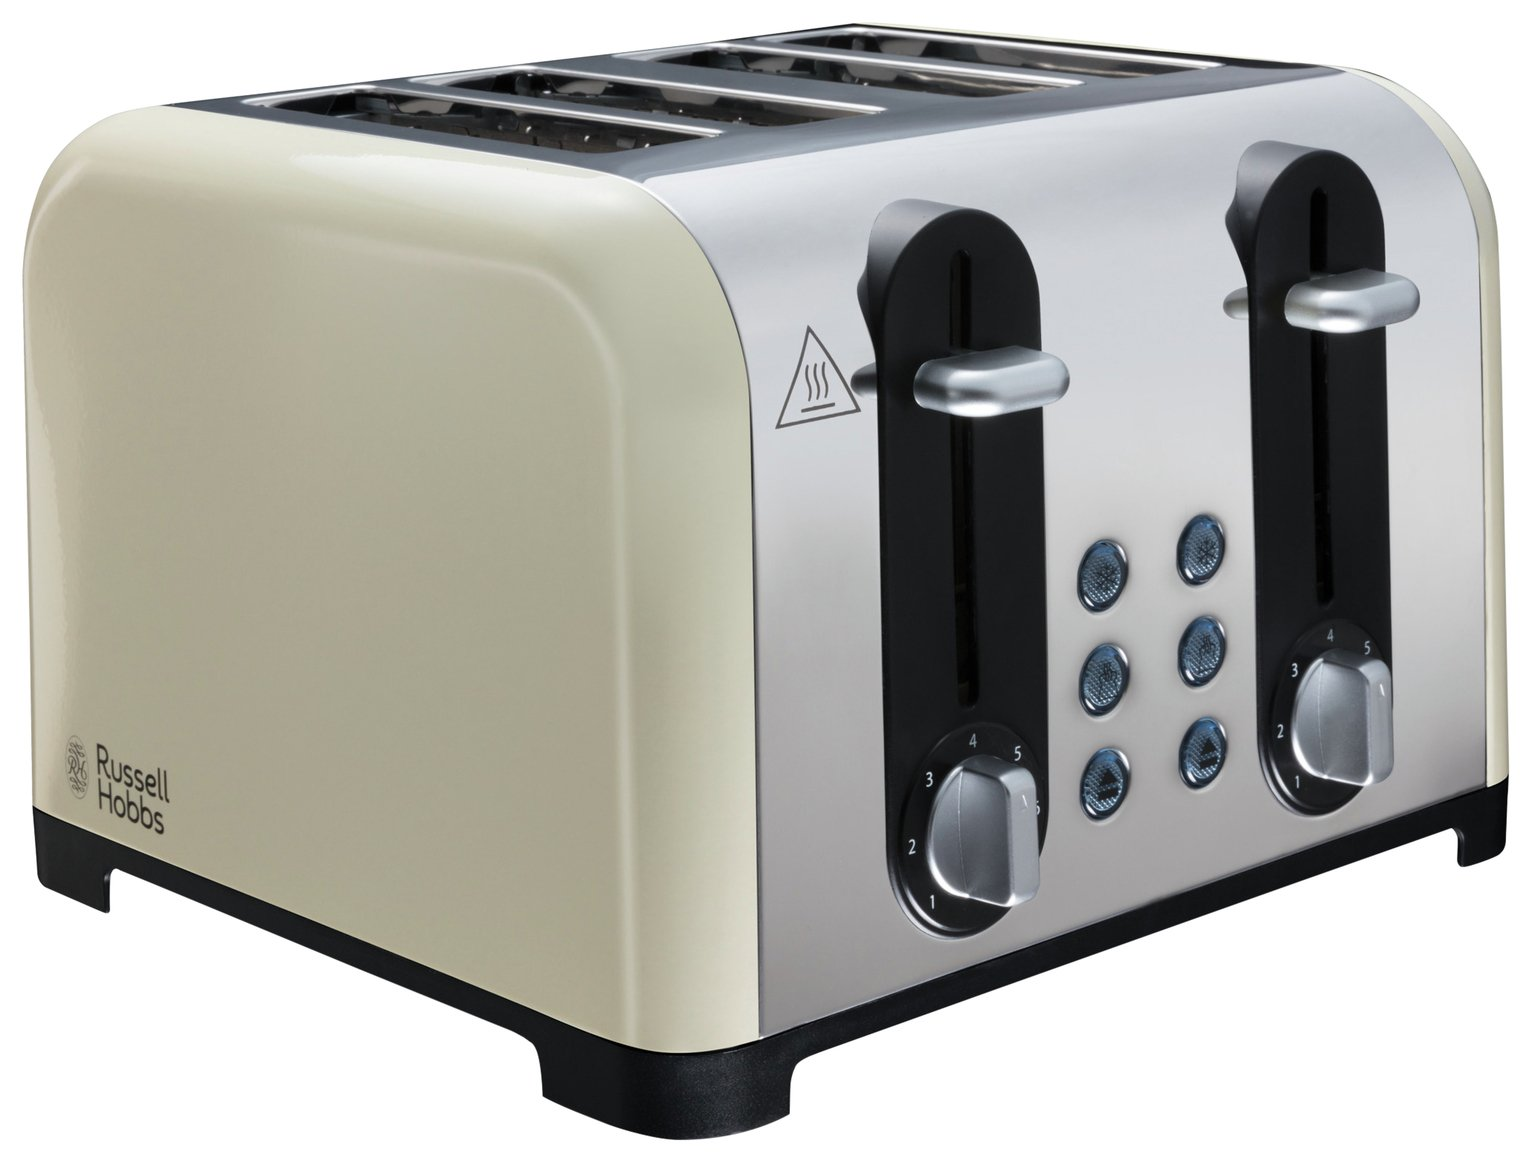 Russell Hobbs 22408 Worcester 4 Slice Toaster - Cream